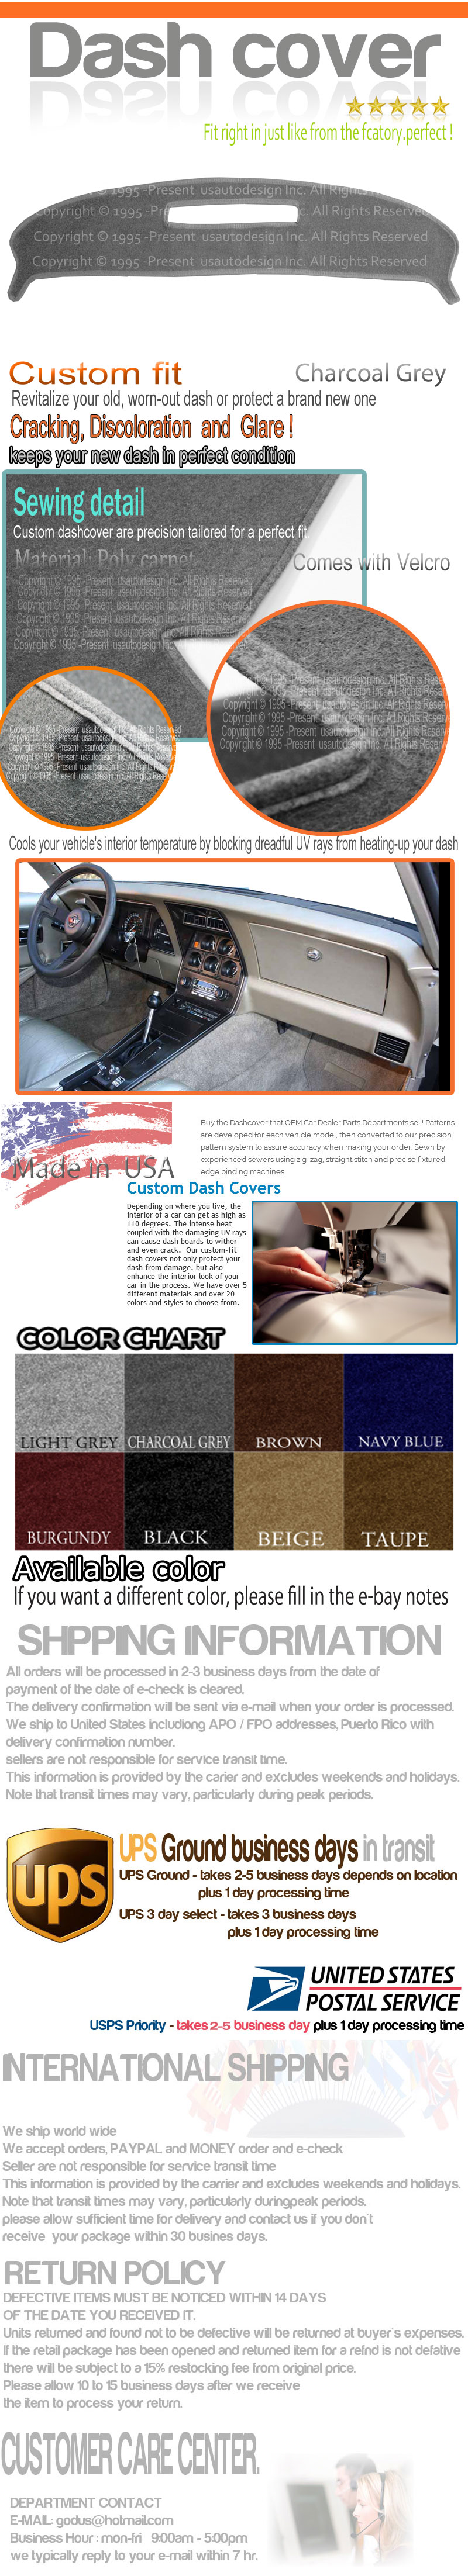 CHARCOAL GREY fits 1983-1989  CHEVROLET CORVETTE DASH COVER MAT DASHBOARD PAD